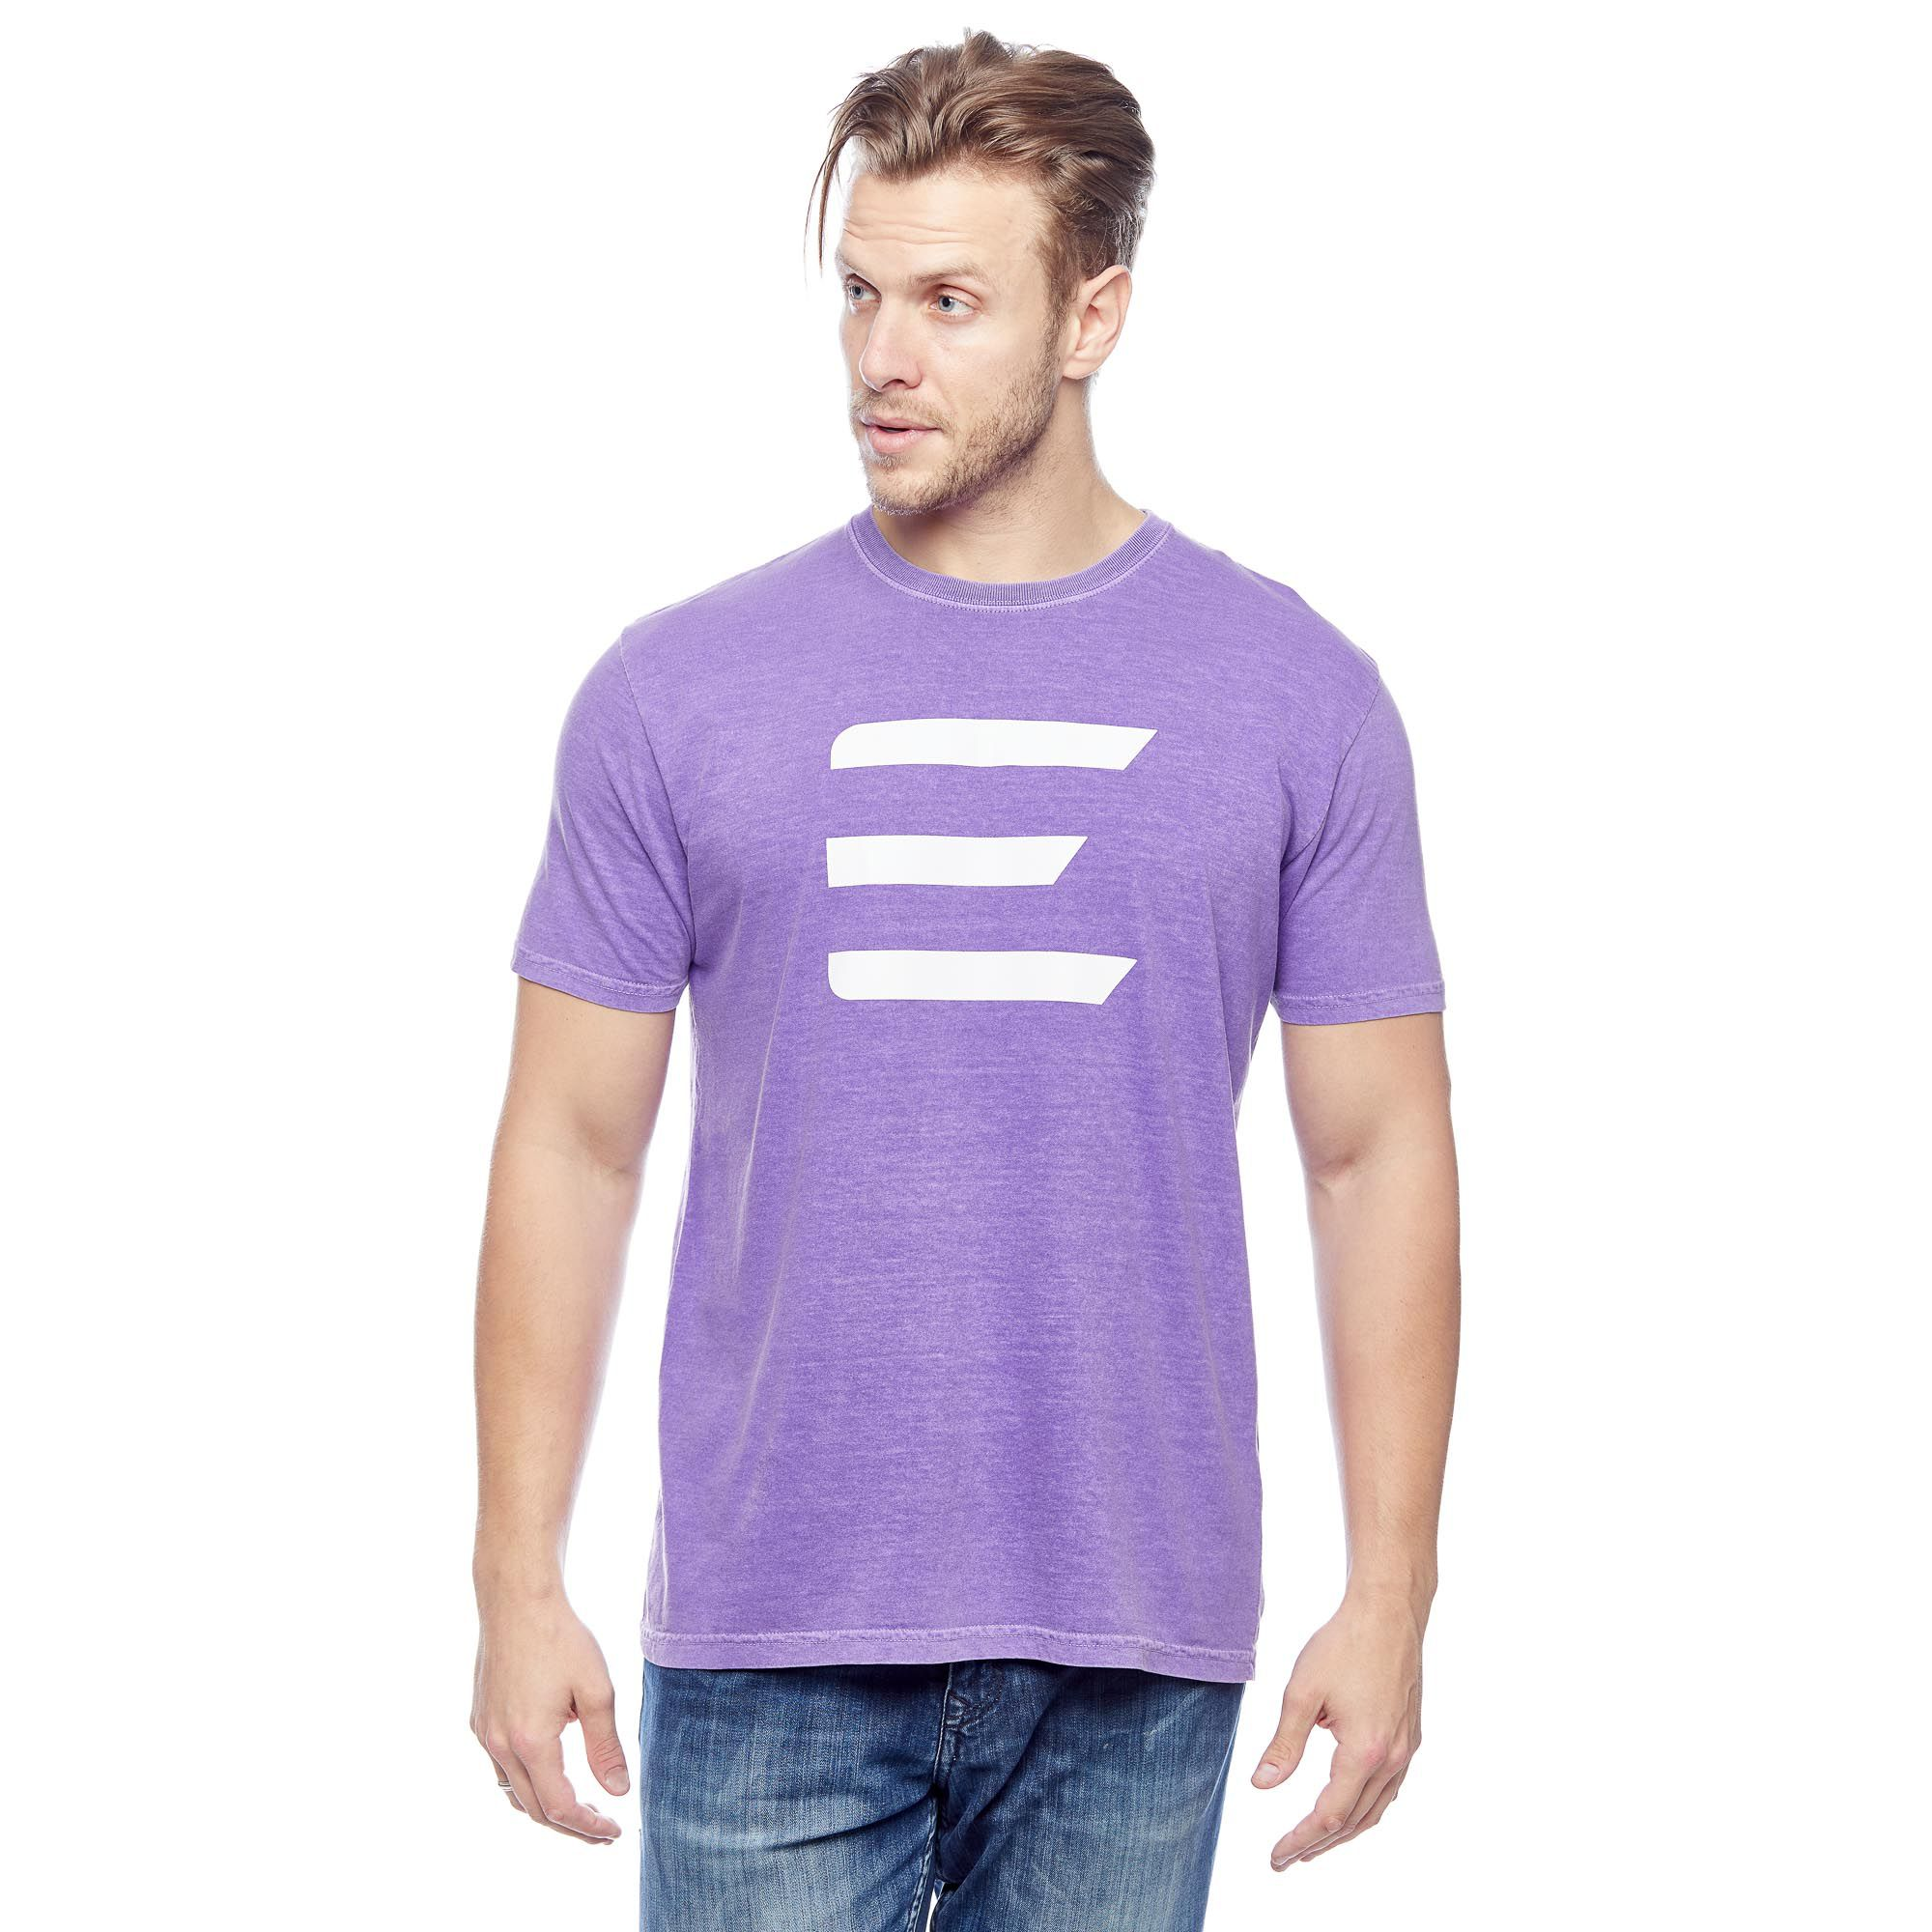 Camiseta Evolvee E-Sport Masculina